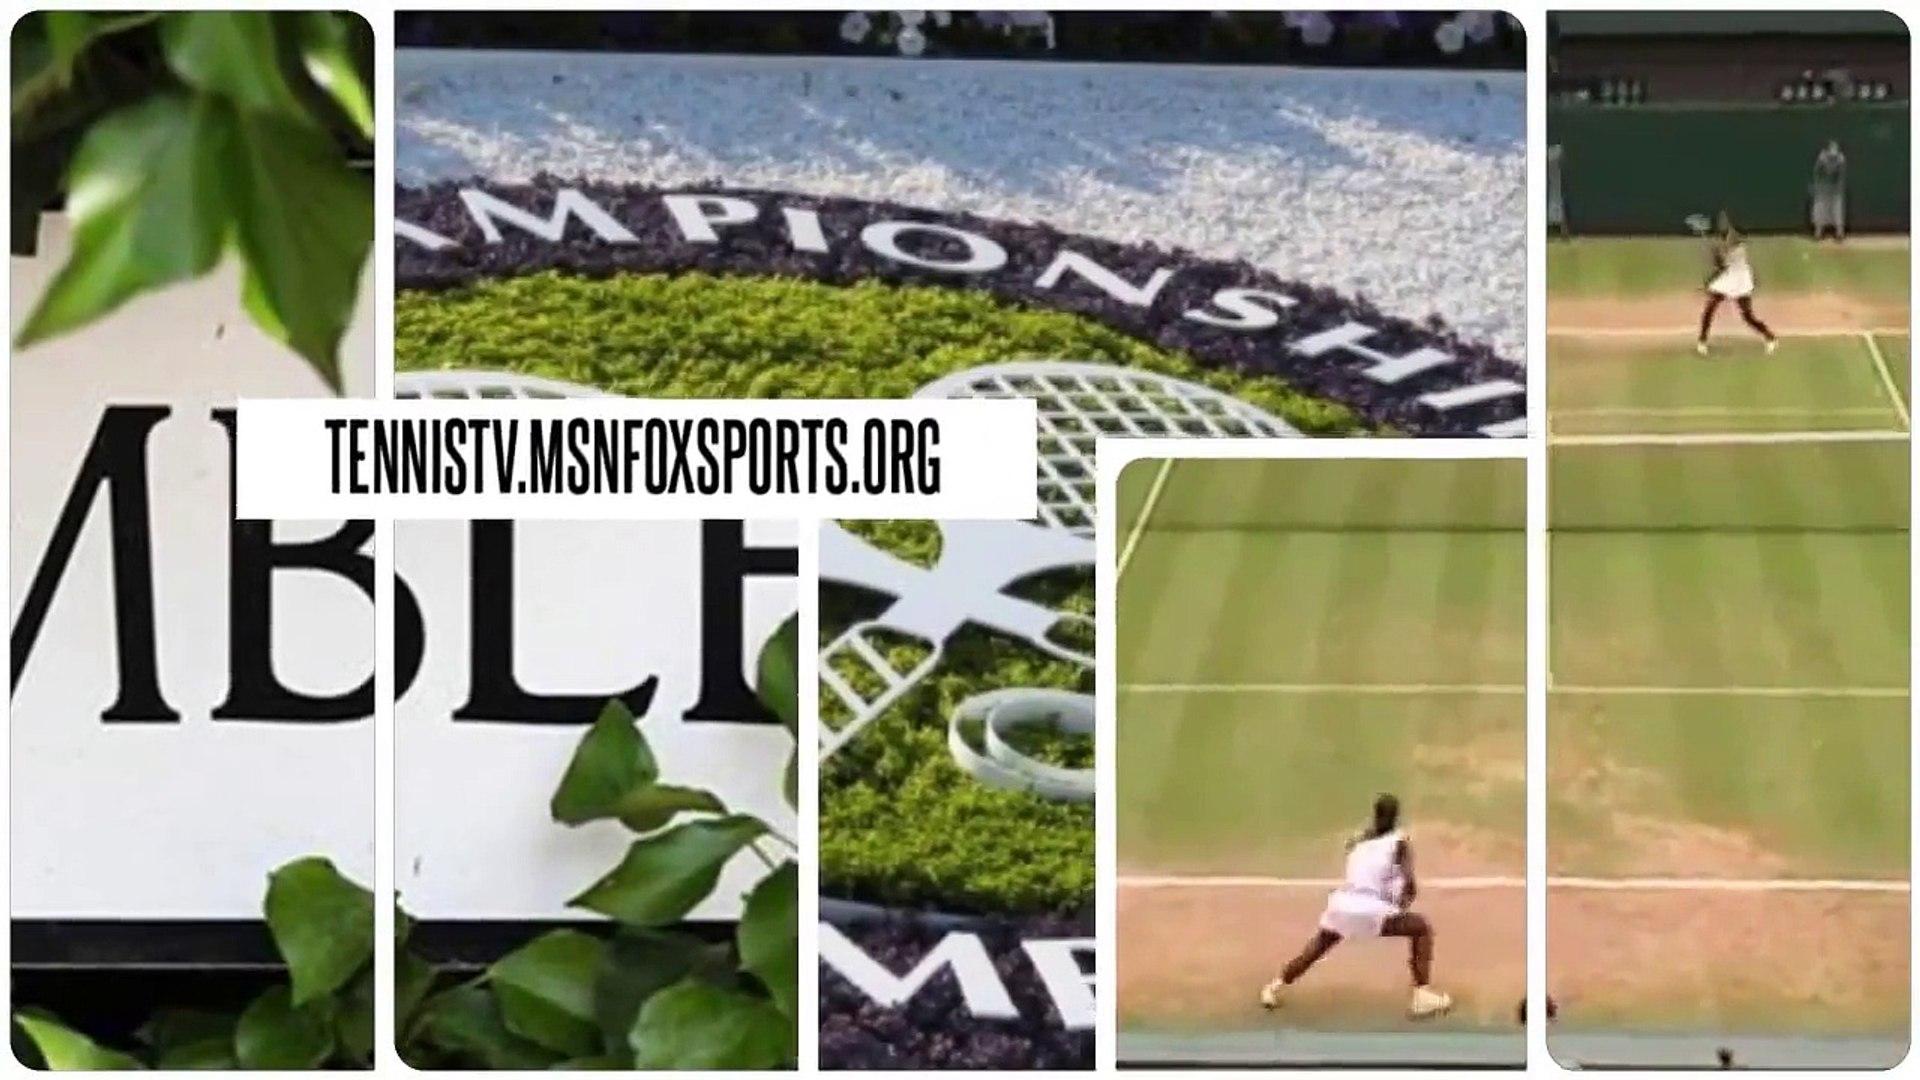 Watch - Caroline Wozniacki v Svetlana Kuznetsova - Wimbledon Singles 2016 Day One